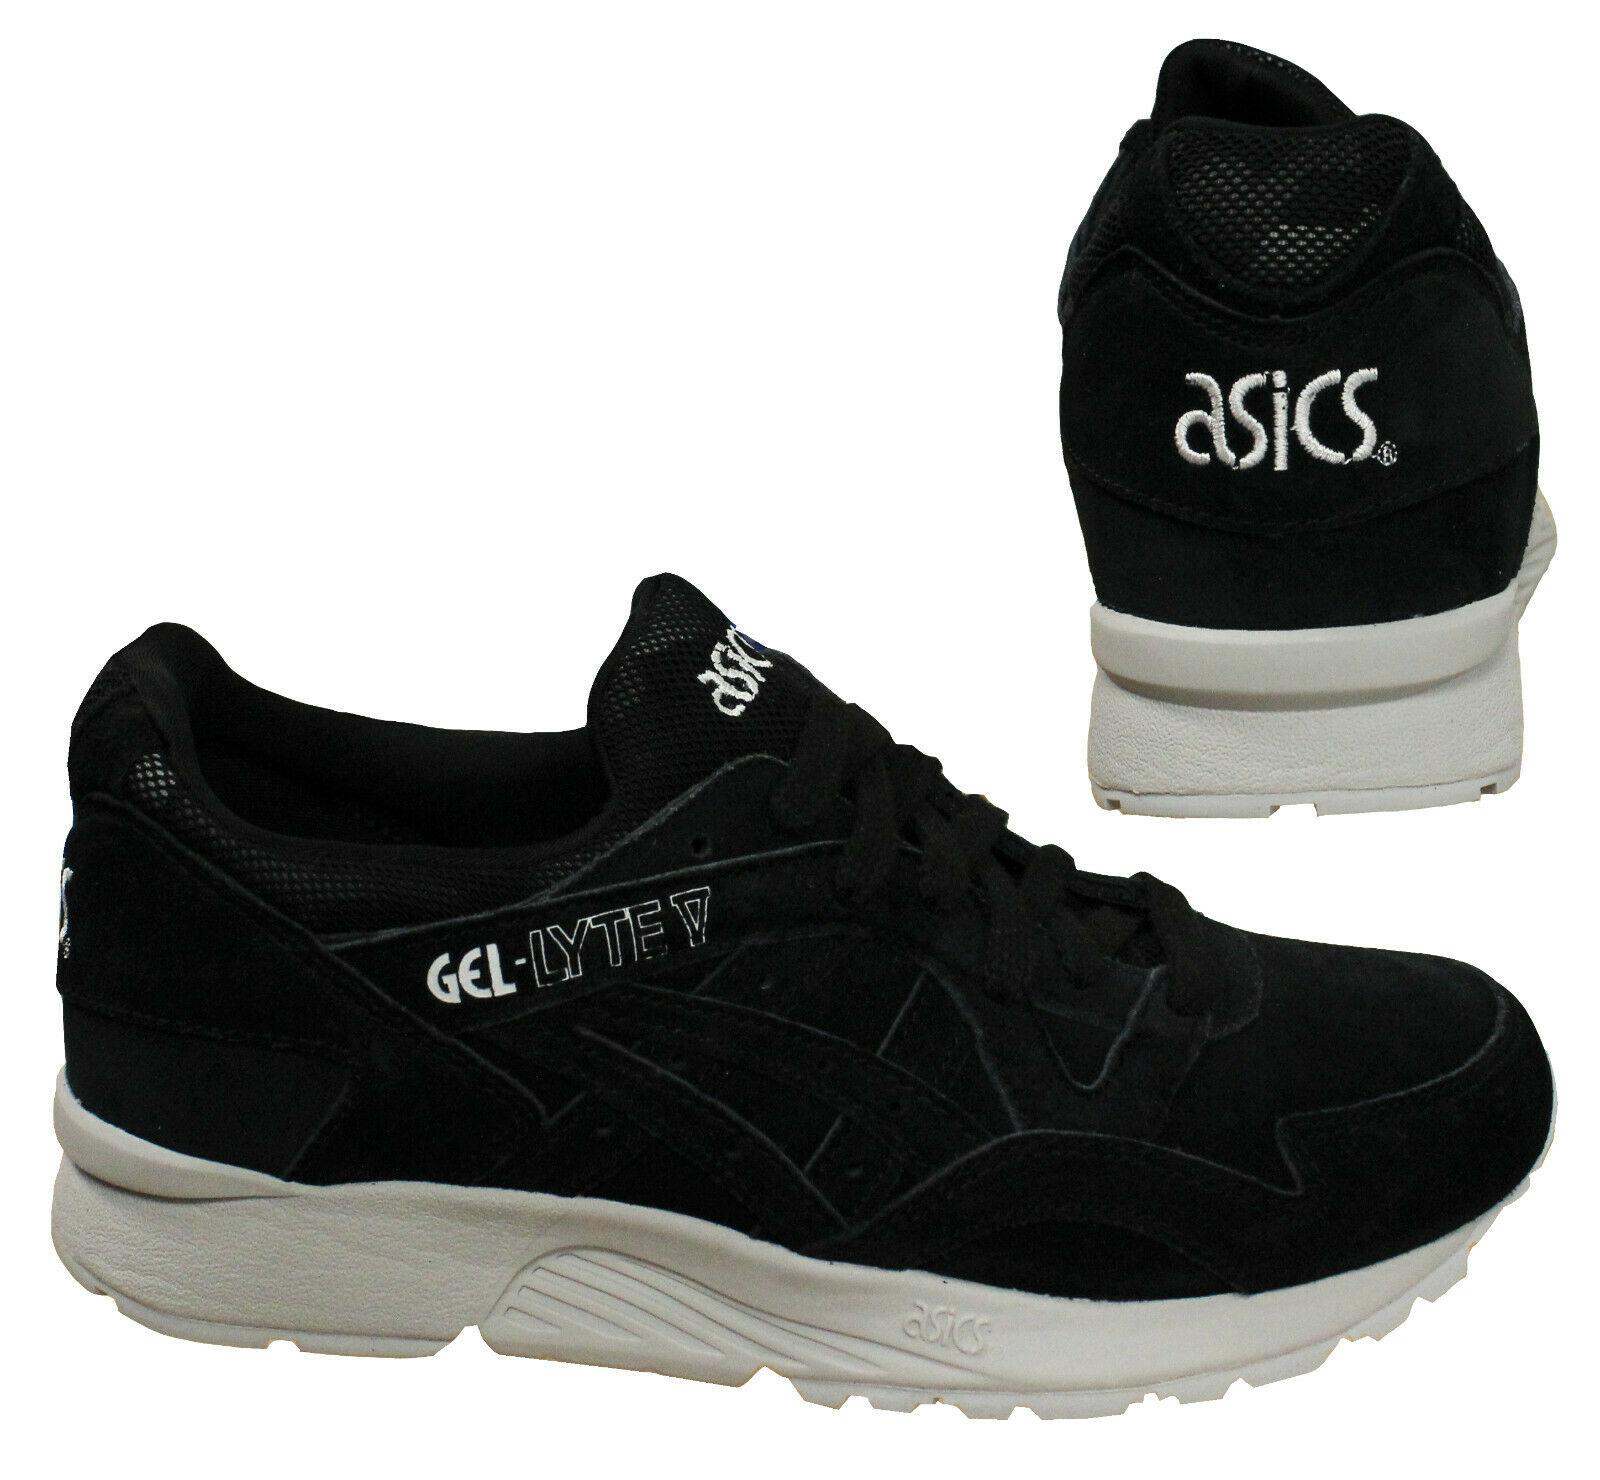 Teseo Cerdo cooperar  Asics Gel-Lyte V Black Lace Up Mens Low Top Suede Sport Trainers H732L 9090  B34D | eBay